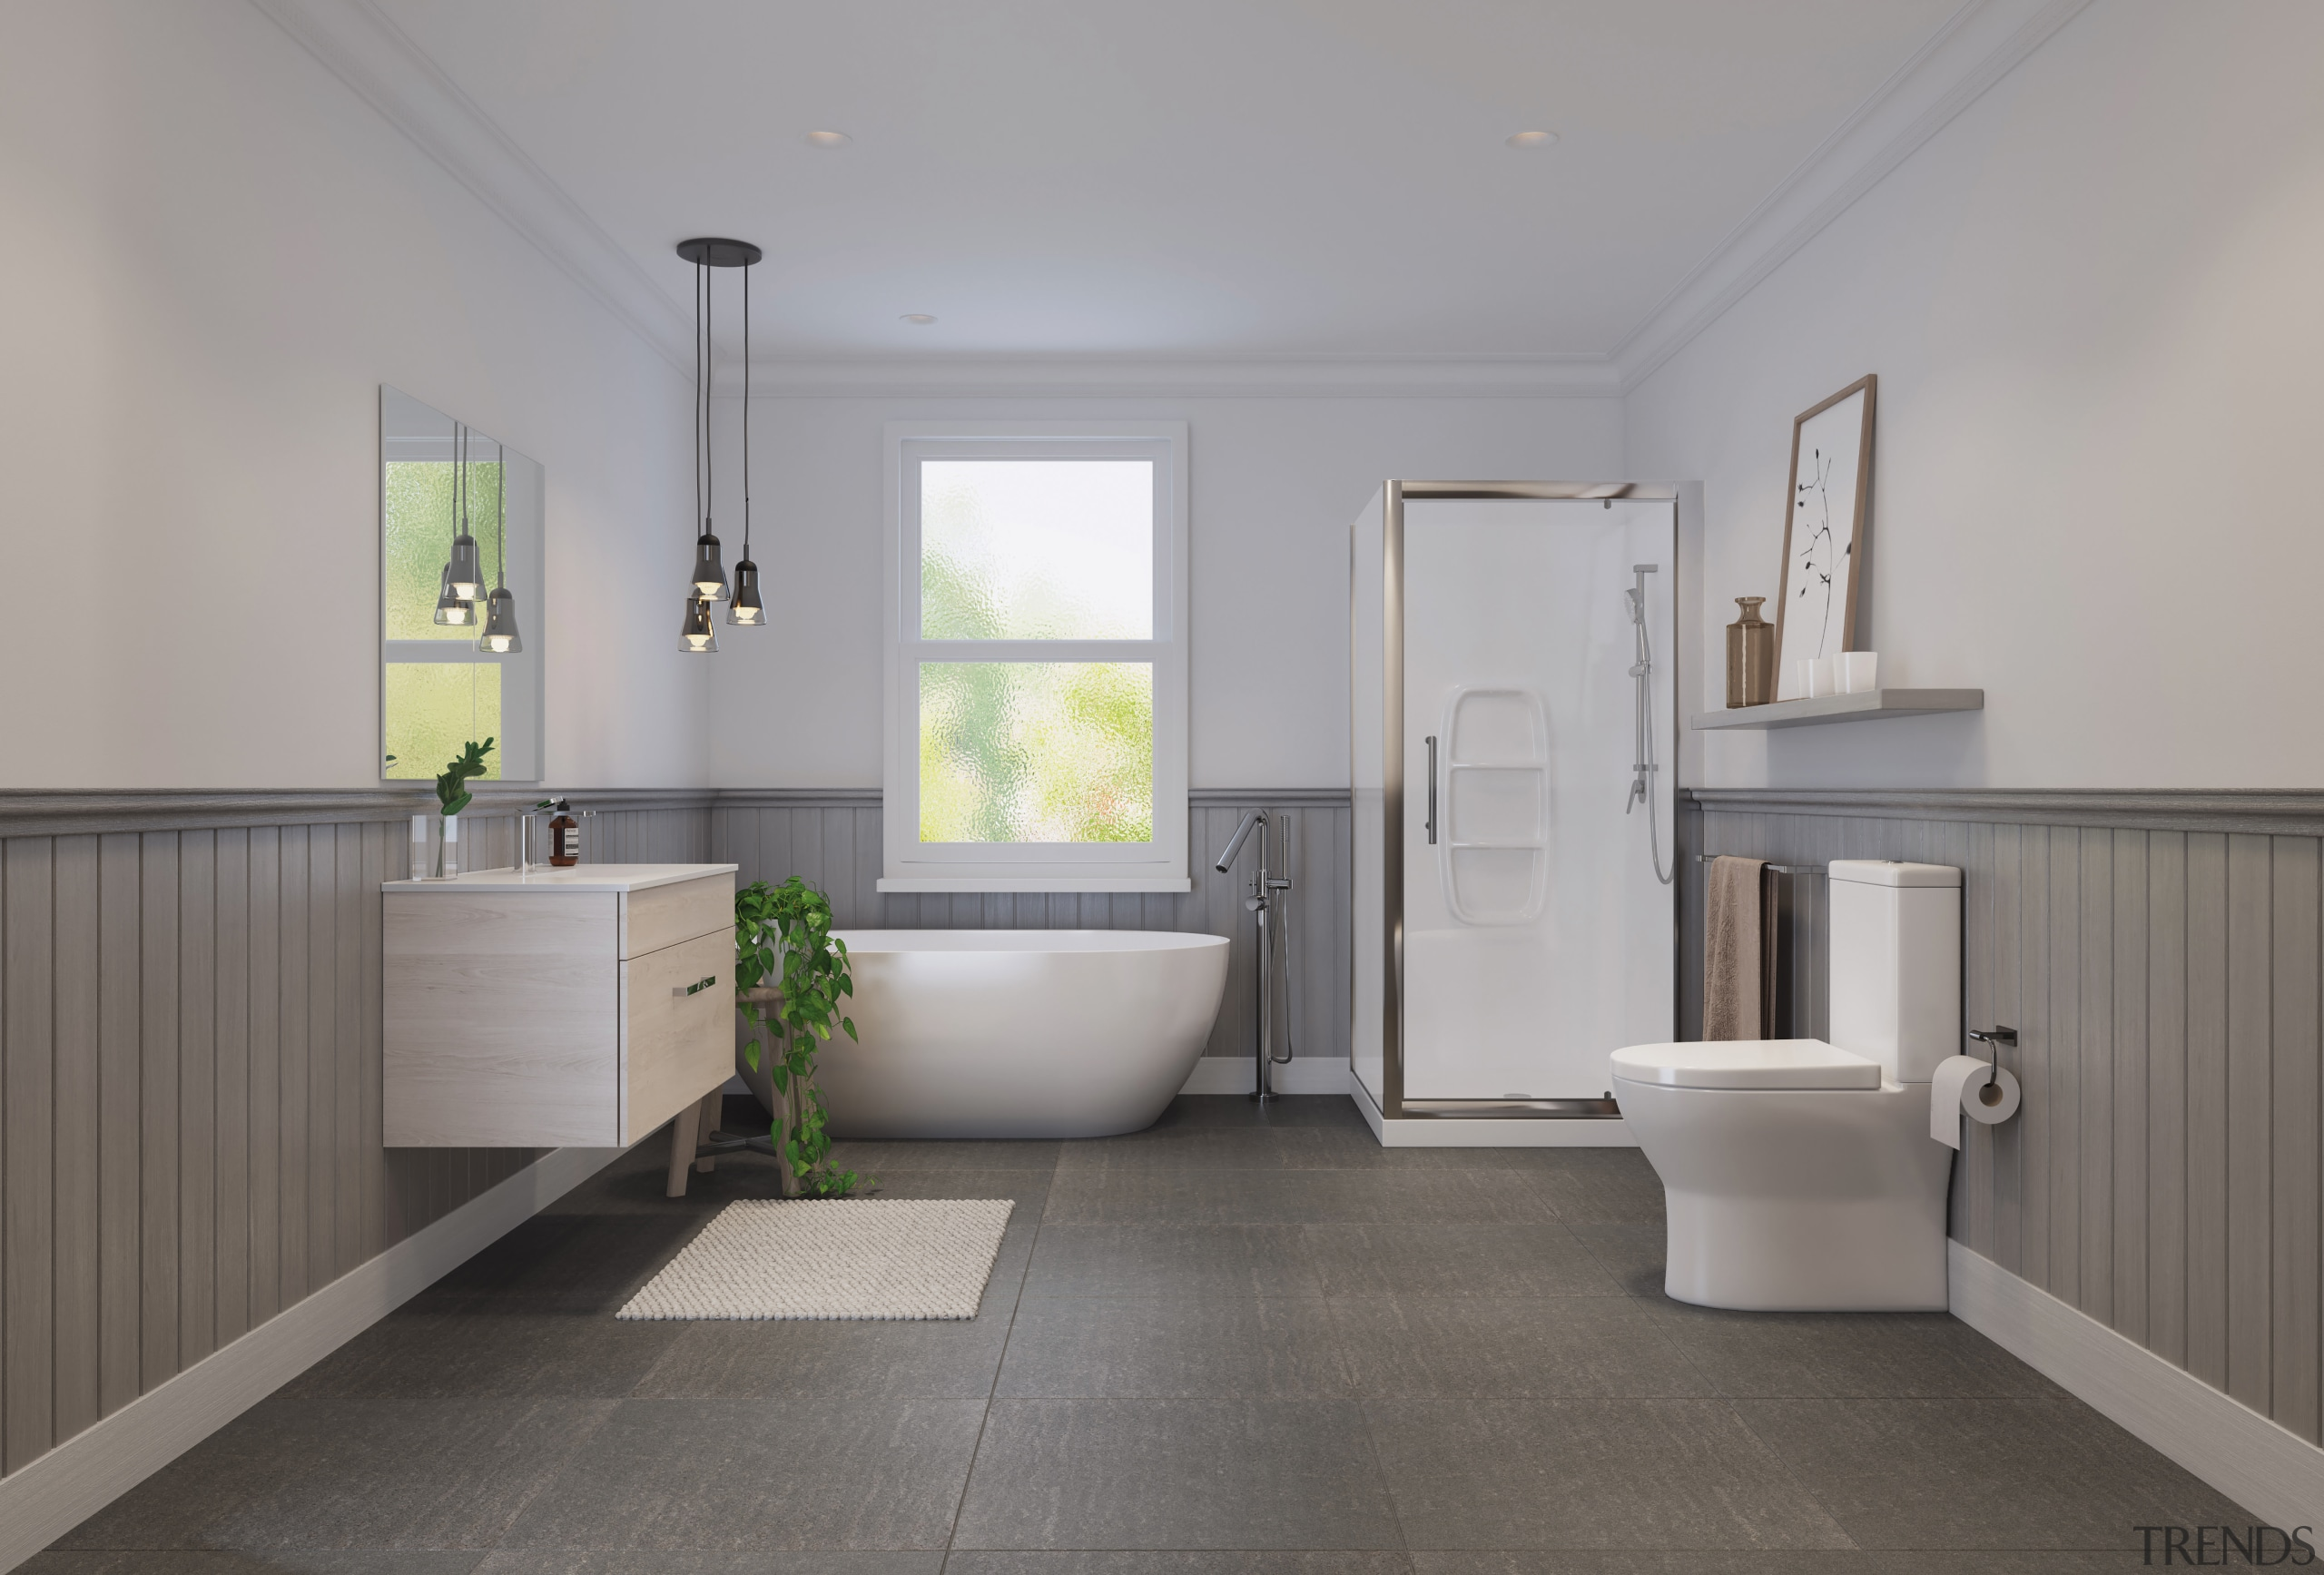 Bathroom by LeVivi - architecture | bathroom | architecture, bathroom, daylighting, floor, flooring, home, interior design, plumbing fixture, real estate, room, sink, tile, gray